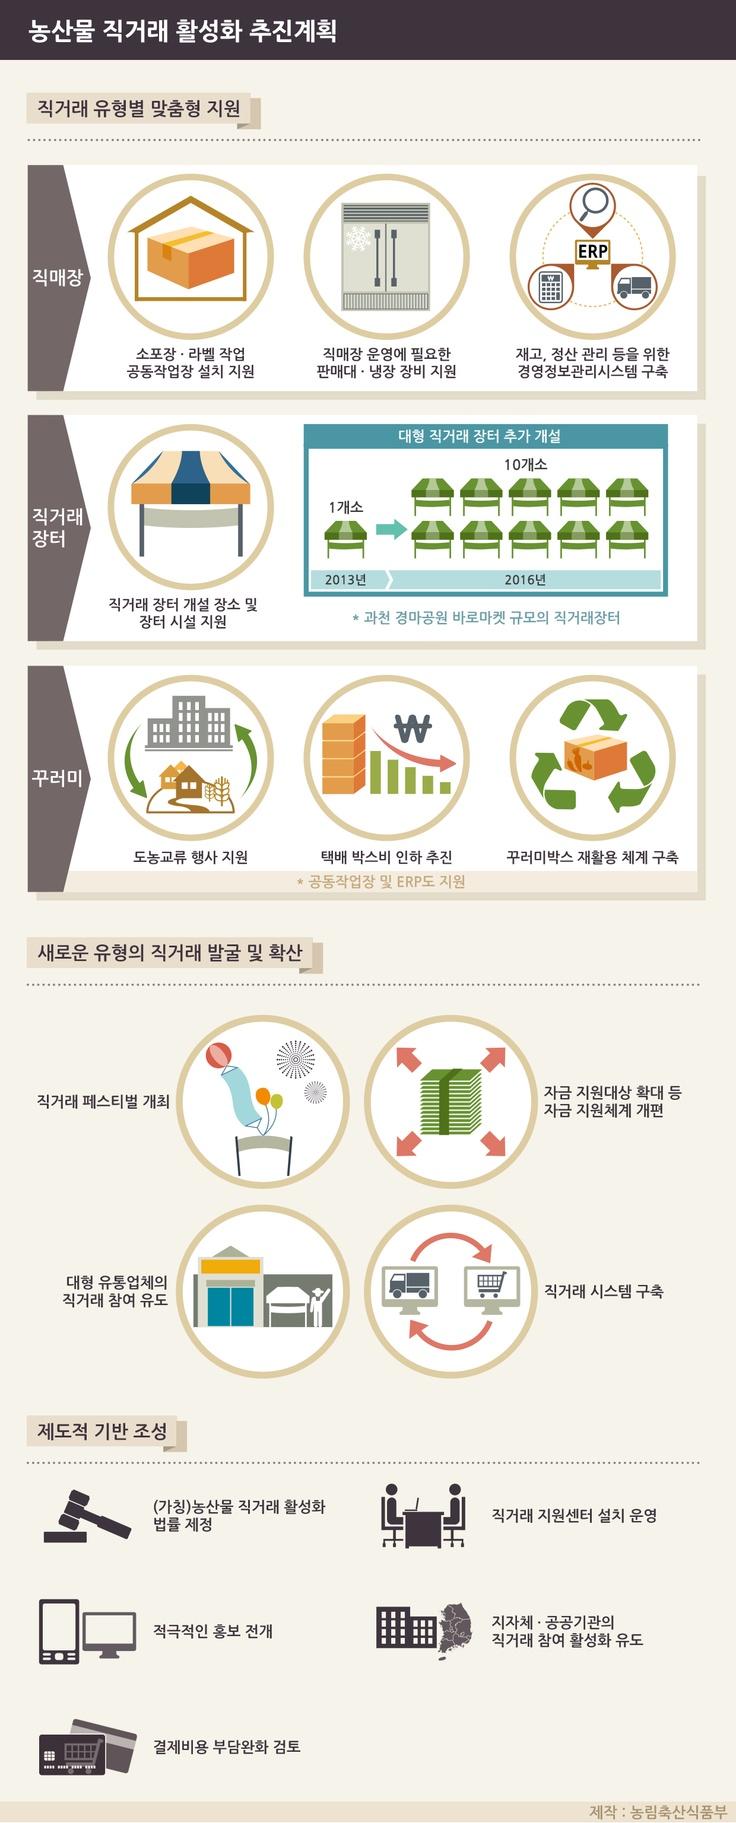 [Infographic] 농림축산식품부의 '농산물 직거래 활성화 추진계획'에 관한 인포그래픽